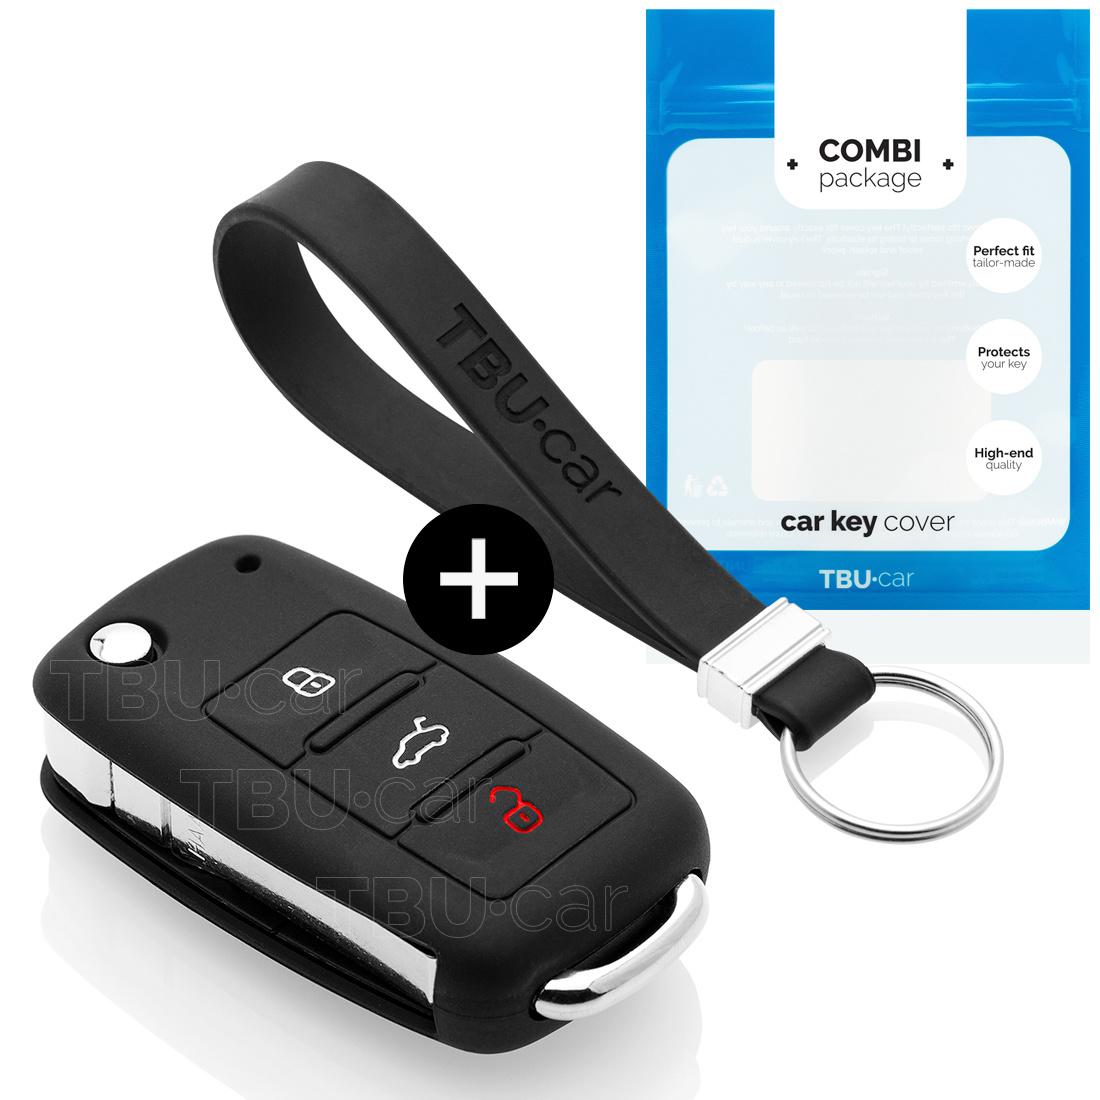 TBU car TBU car Sleutel cover compatibel met Audi - Silicone sleutelhoesje - beschermhoesje autosleutel - Zwart